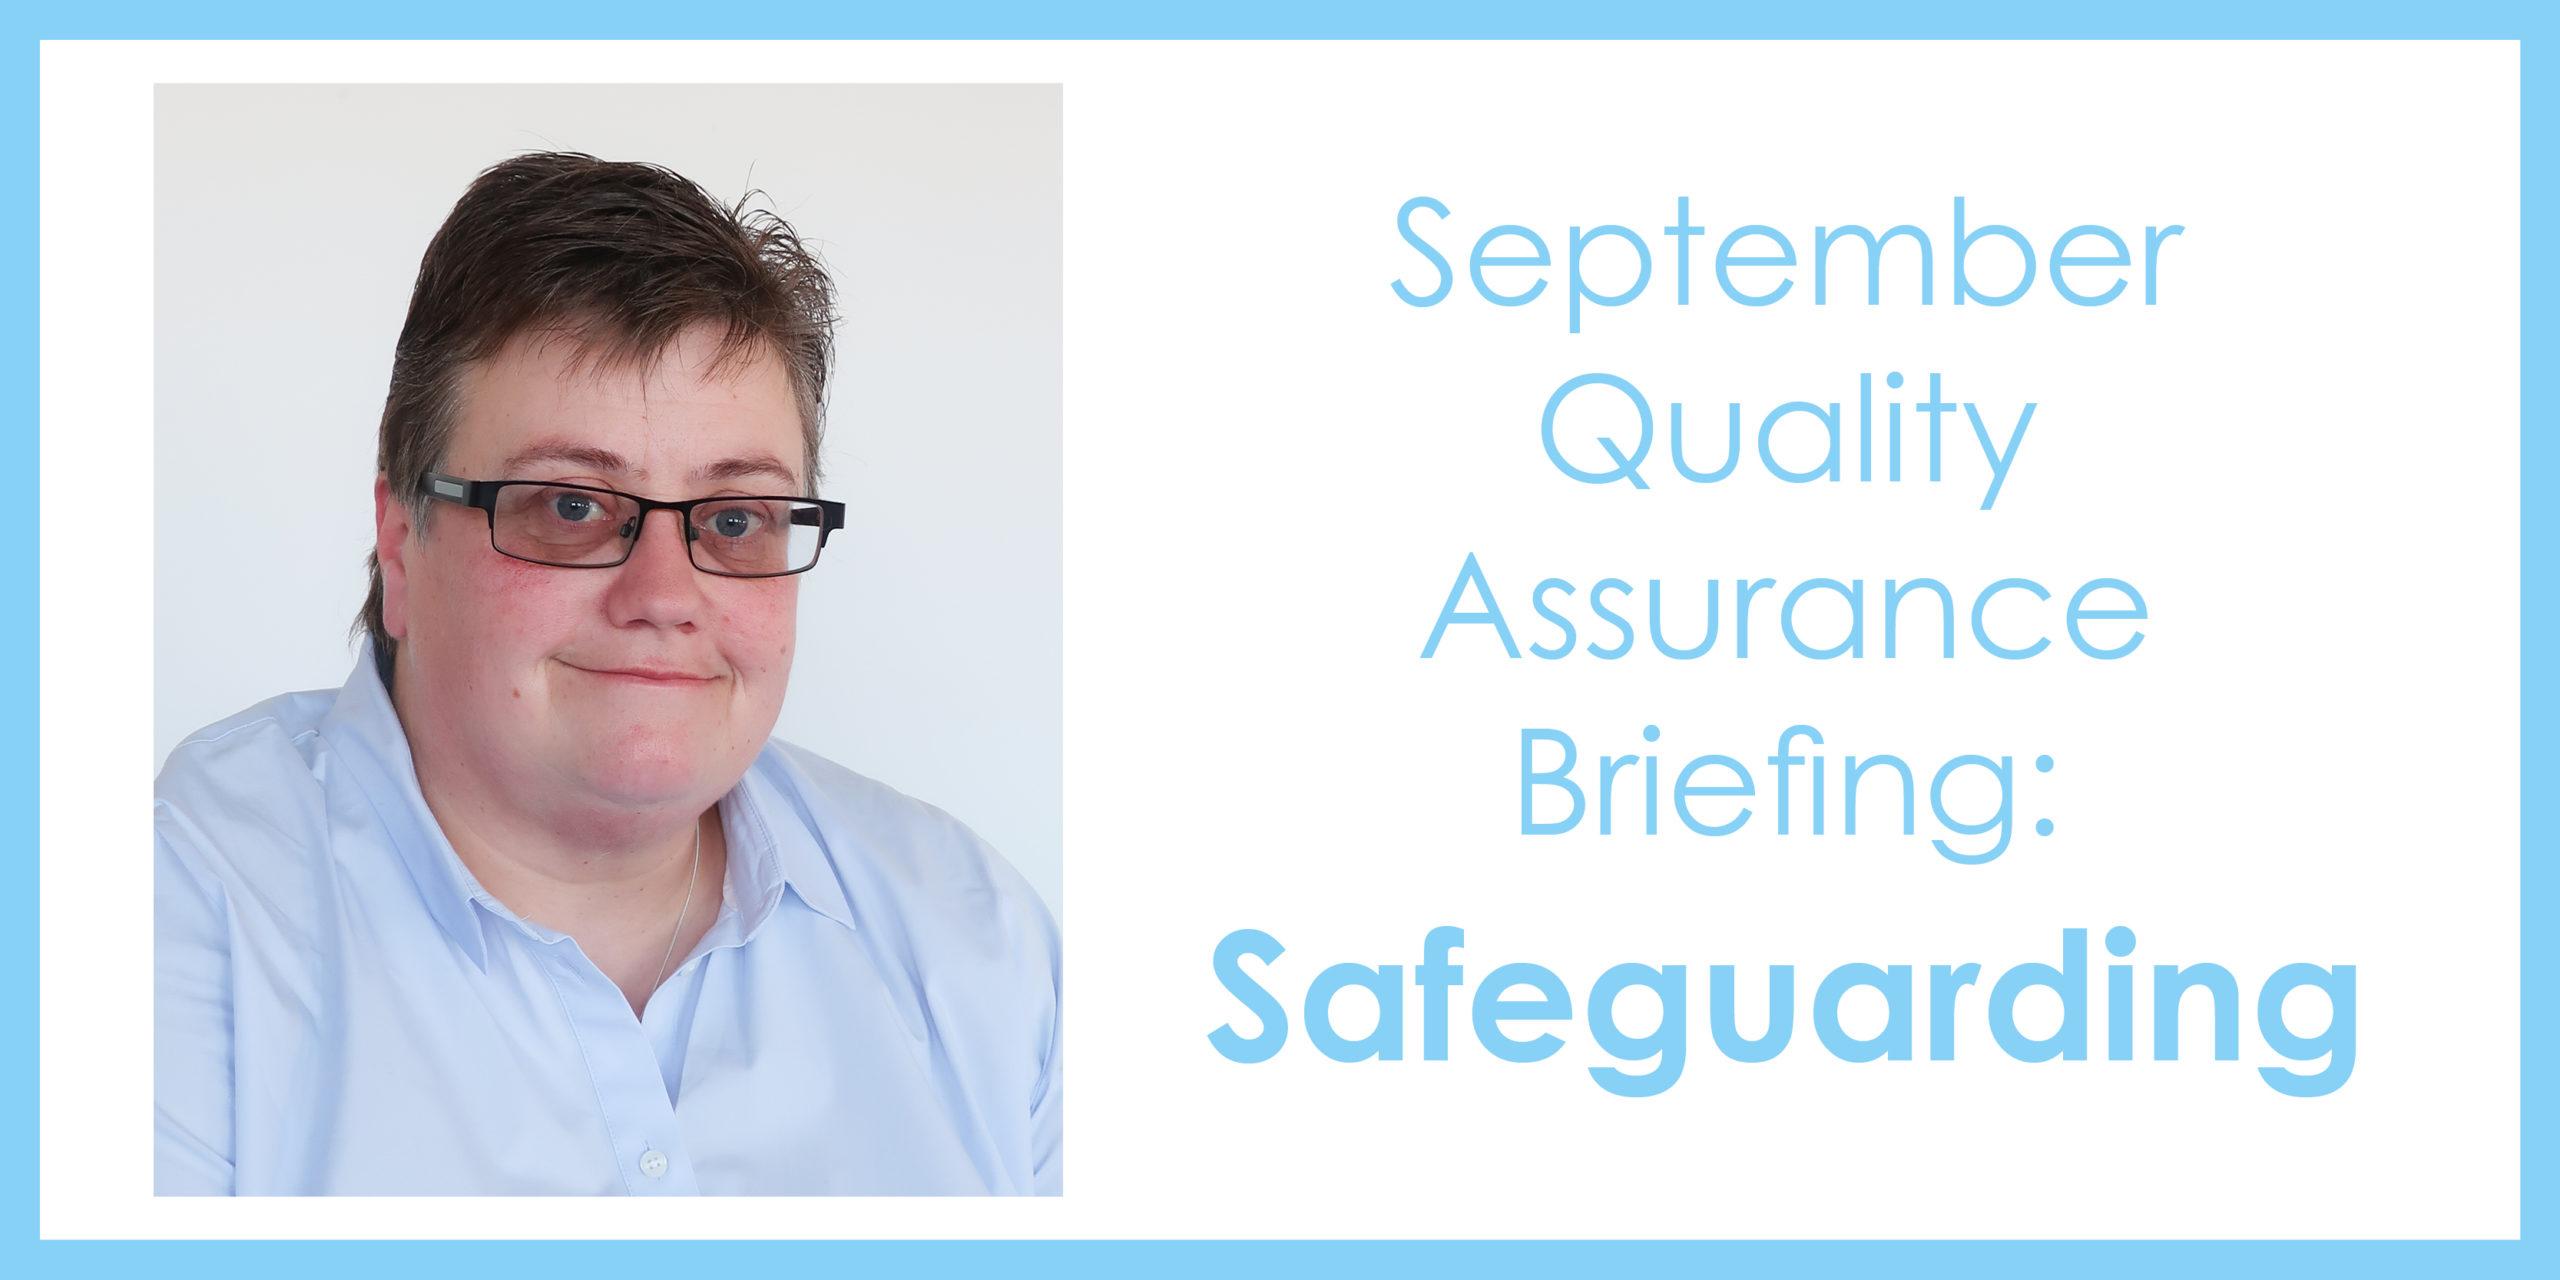 September Quality Assurance Briefing: Safeguarding